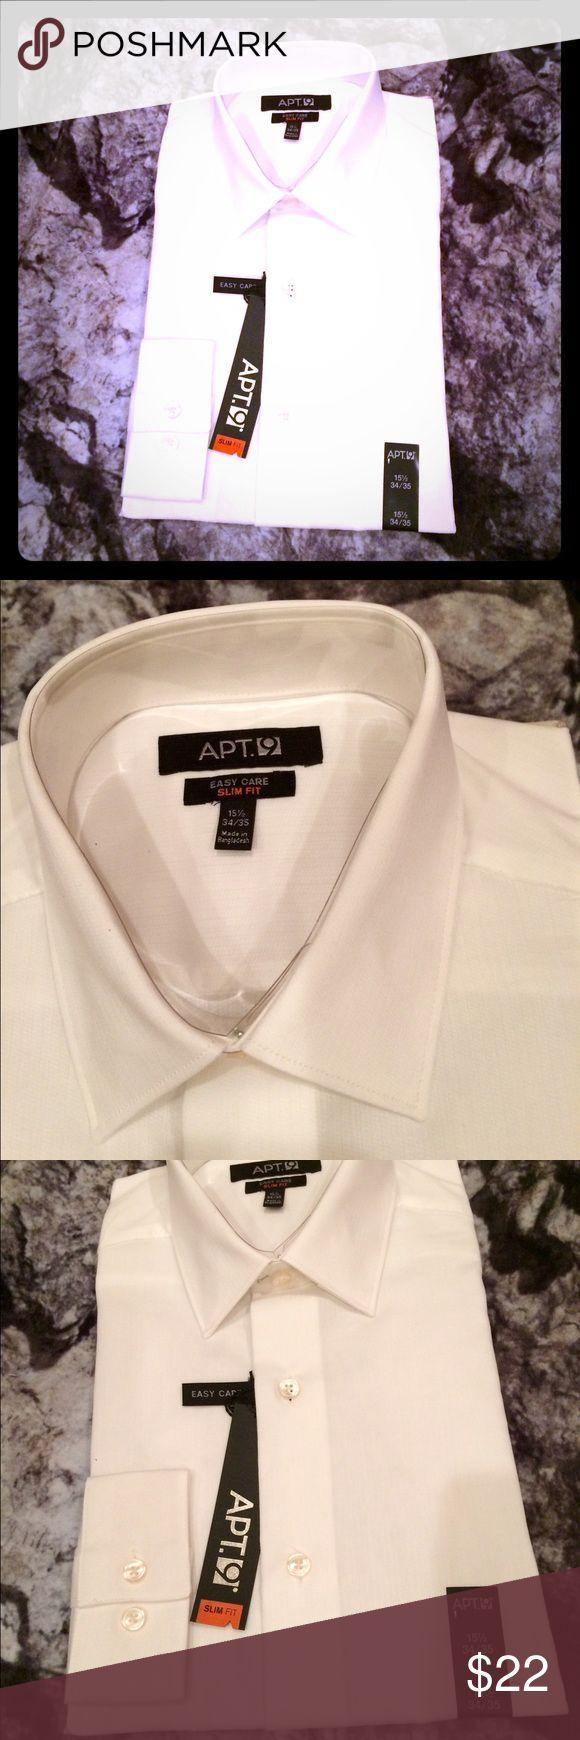 "NWT Apt. 9 Easy Care Slim Fit White Dress Shirt NWT Apt. 9 Easy Care Slim Fit Studio White Dress Shirt. Neck = 15 1/2"" Sleeve = 34/35"" Apt. 9 Shirts Dress Shirts"